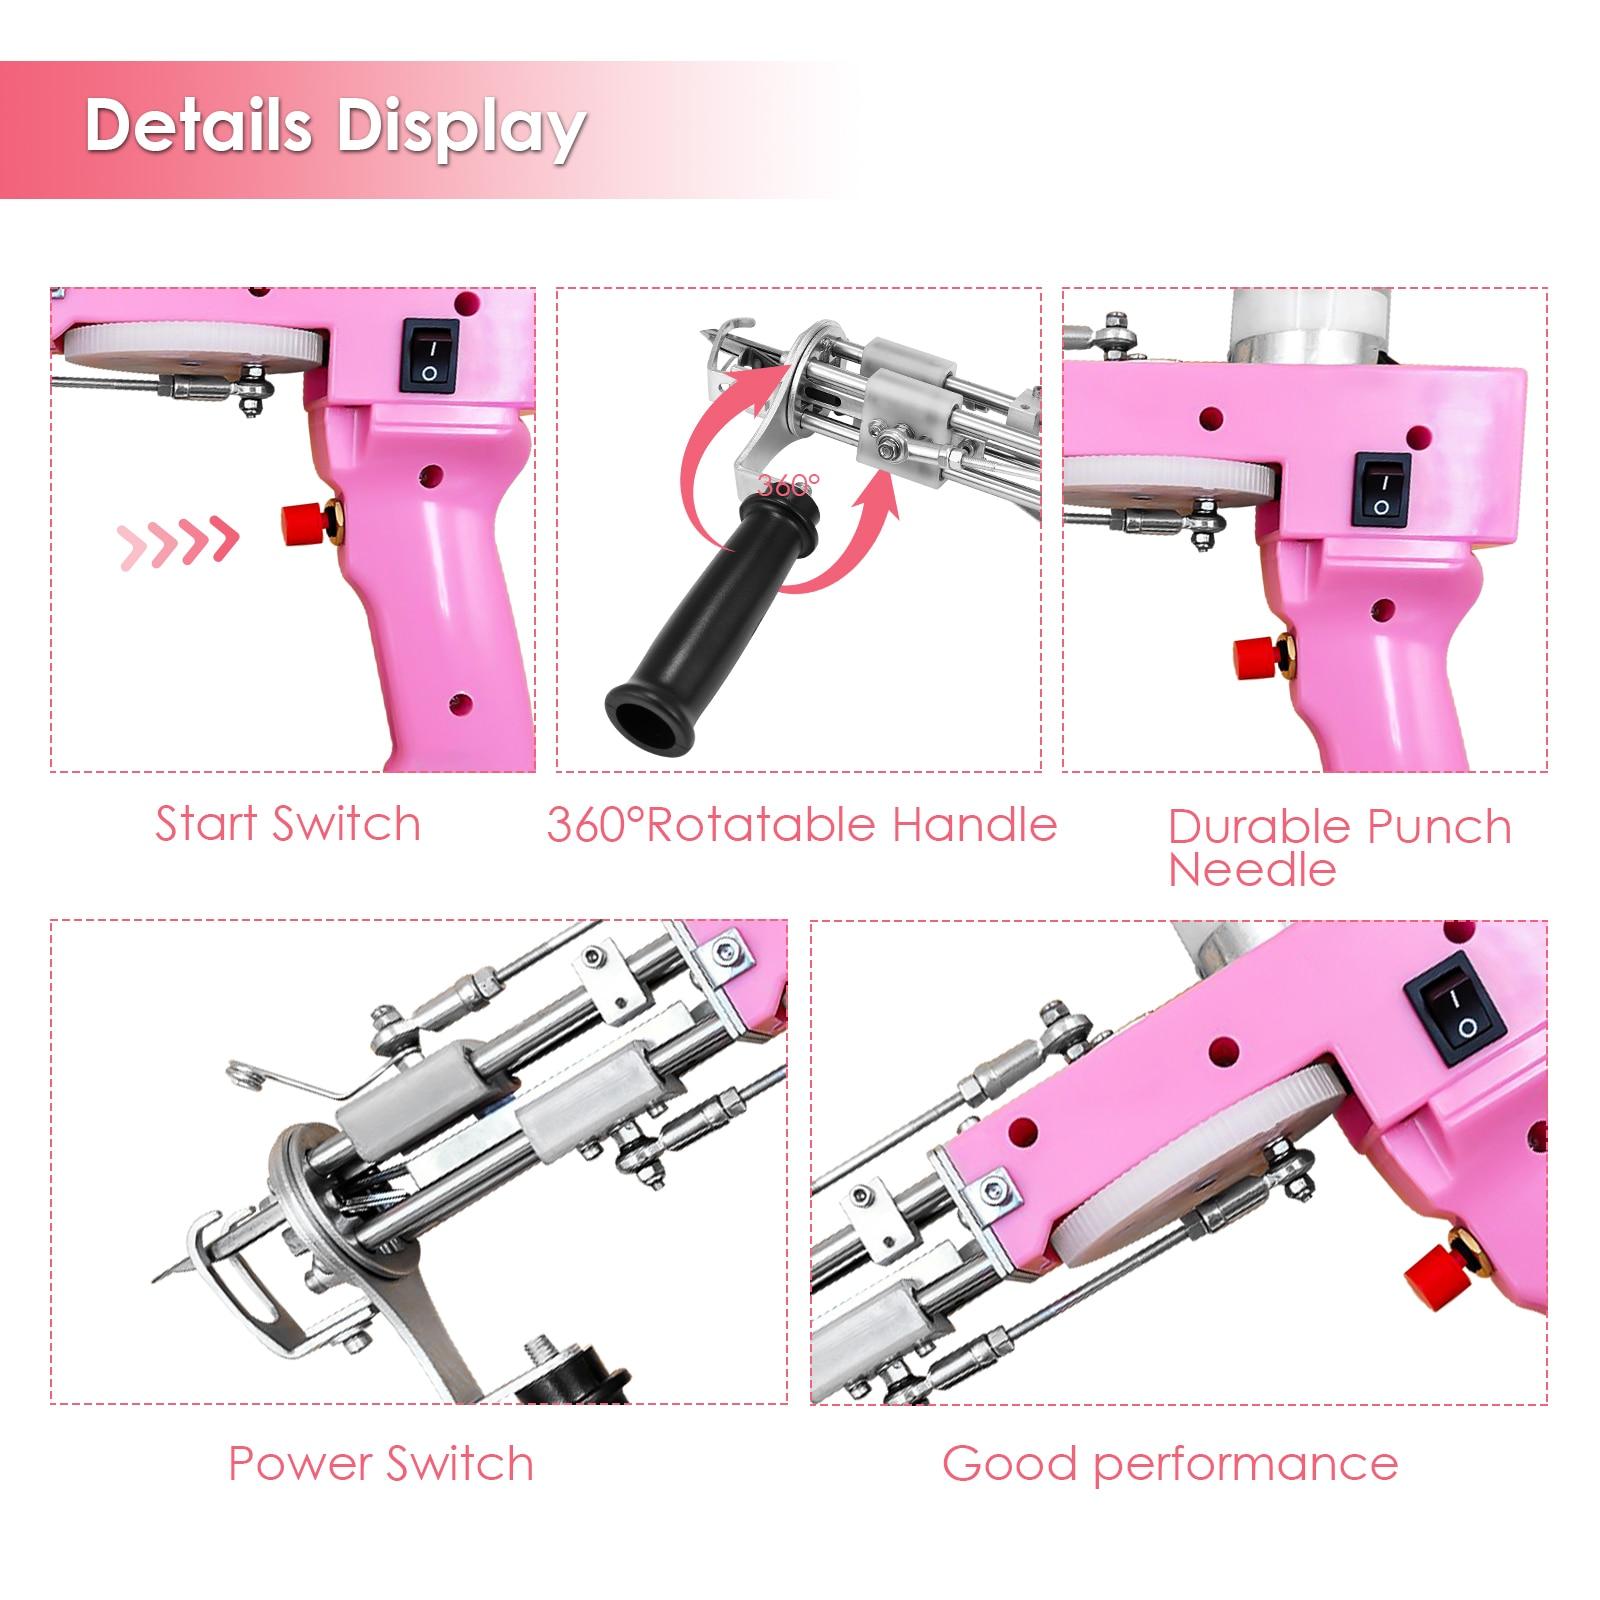 5-40 Stitches Pink Electric Carpet Rug Gun Carpet Weaving Knitting Machine 2 In 1 Tufting Gun Can Do Cut Pile And Loop Pile 220V enlarge